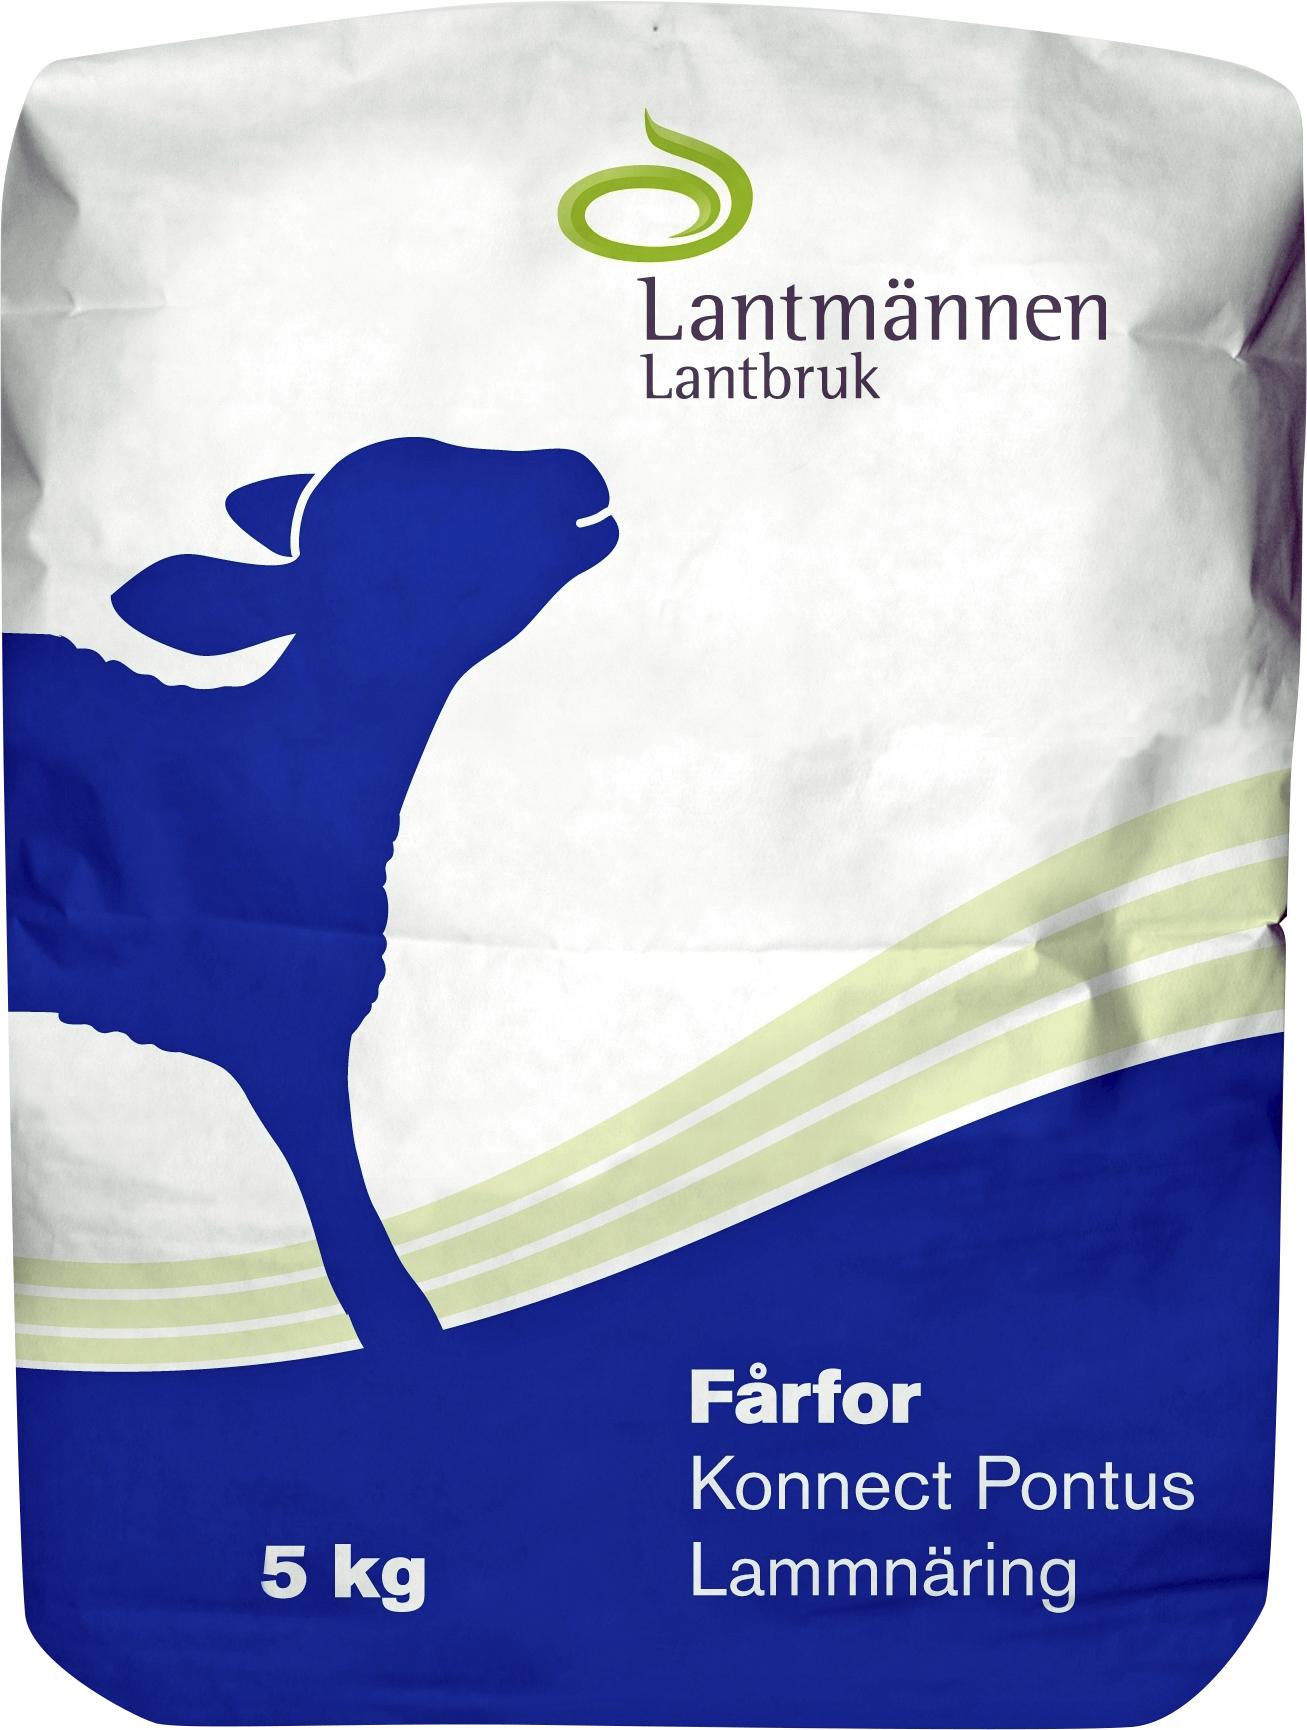 Lammnäring Lantmännen Konnect Pontus, 5 kg